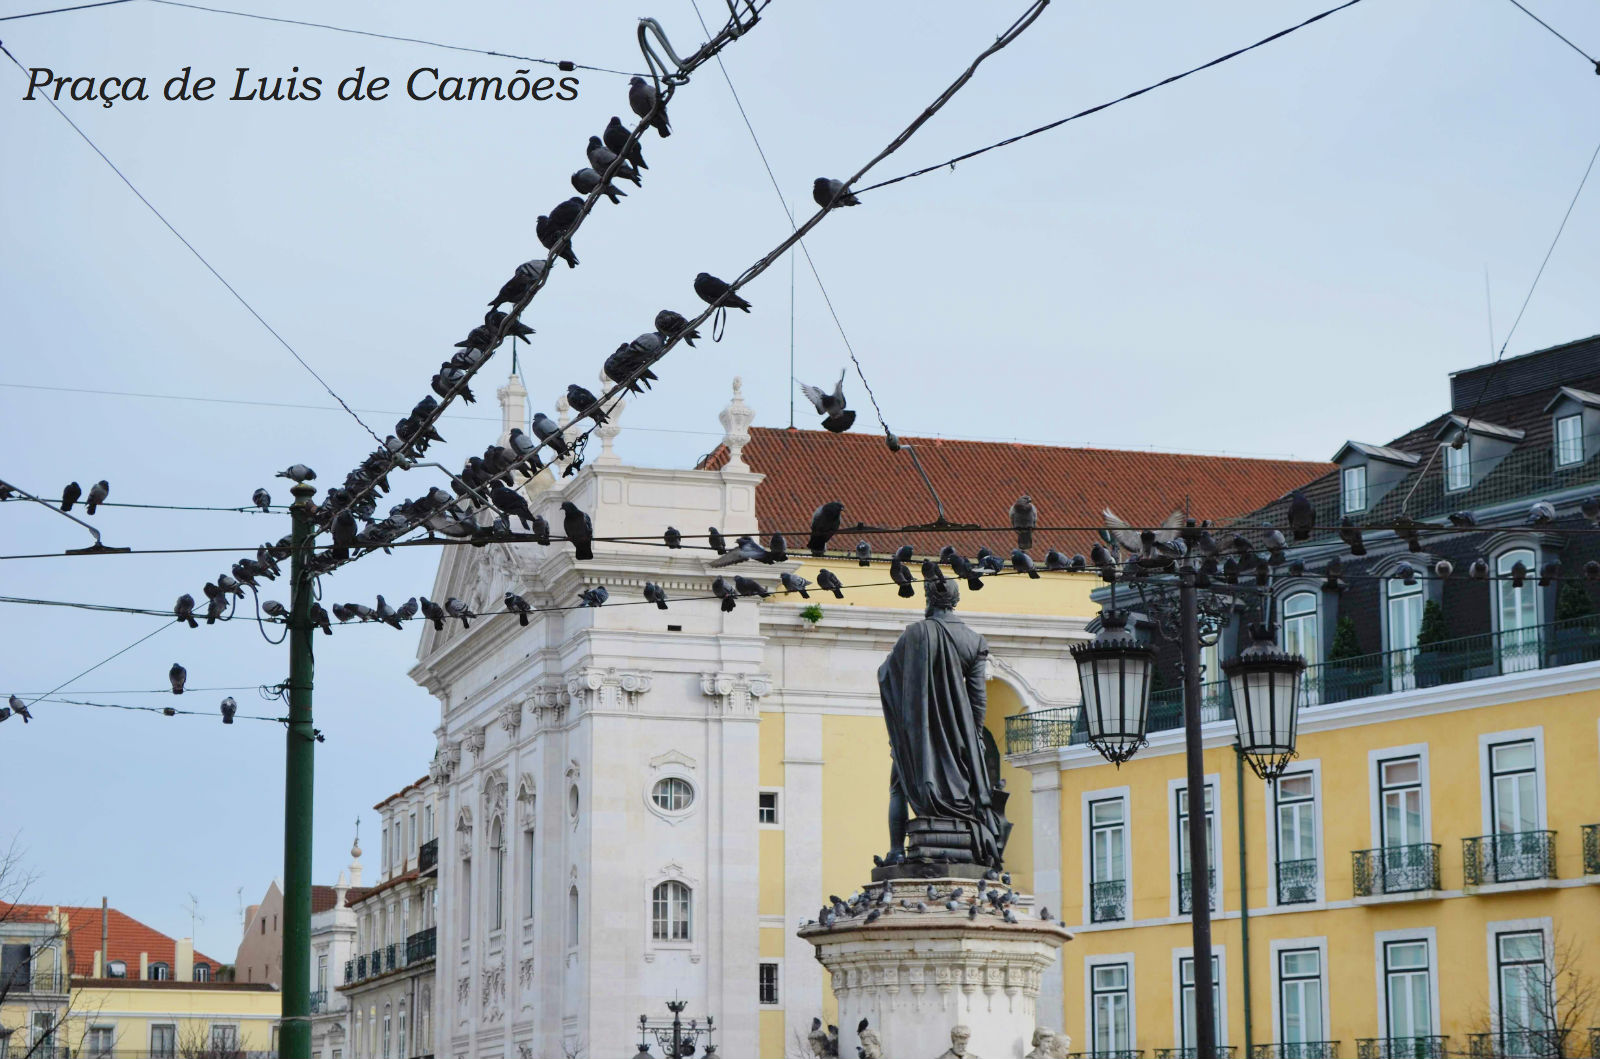 Lisbon praca luis camoes pigeons